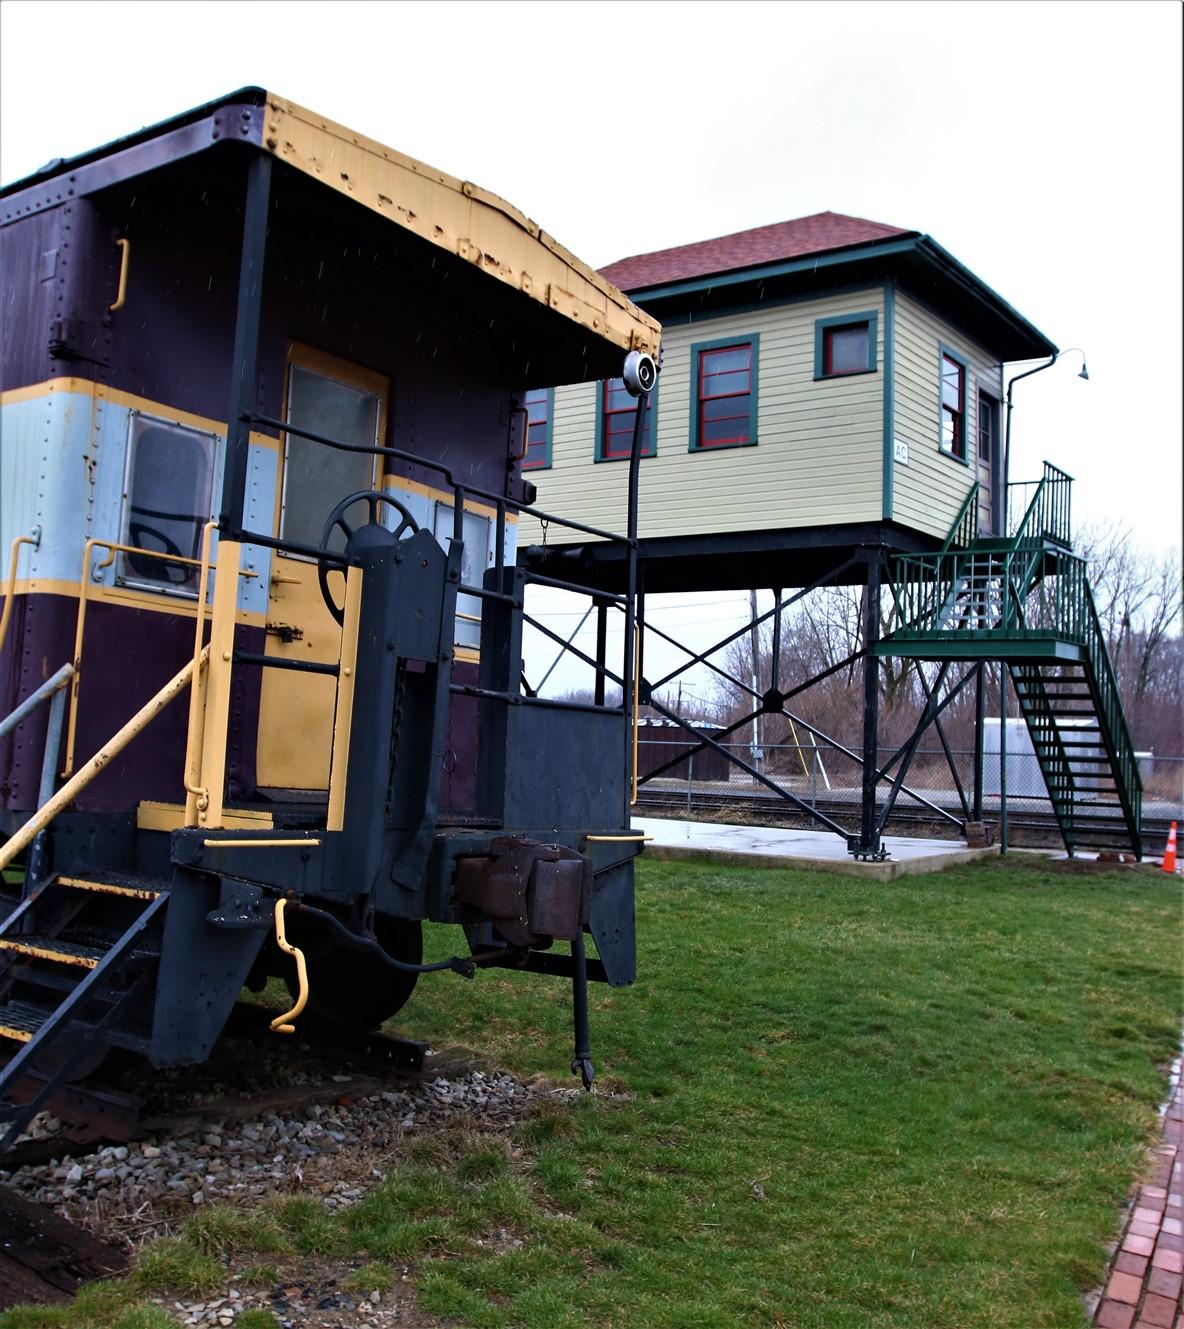 2017 03 18 309 Marion OH Railroad Club Depot.jpg